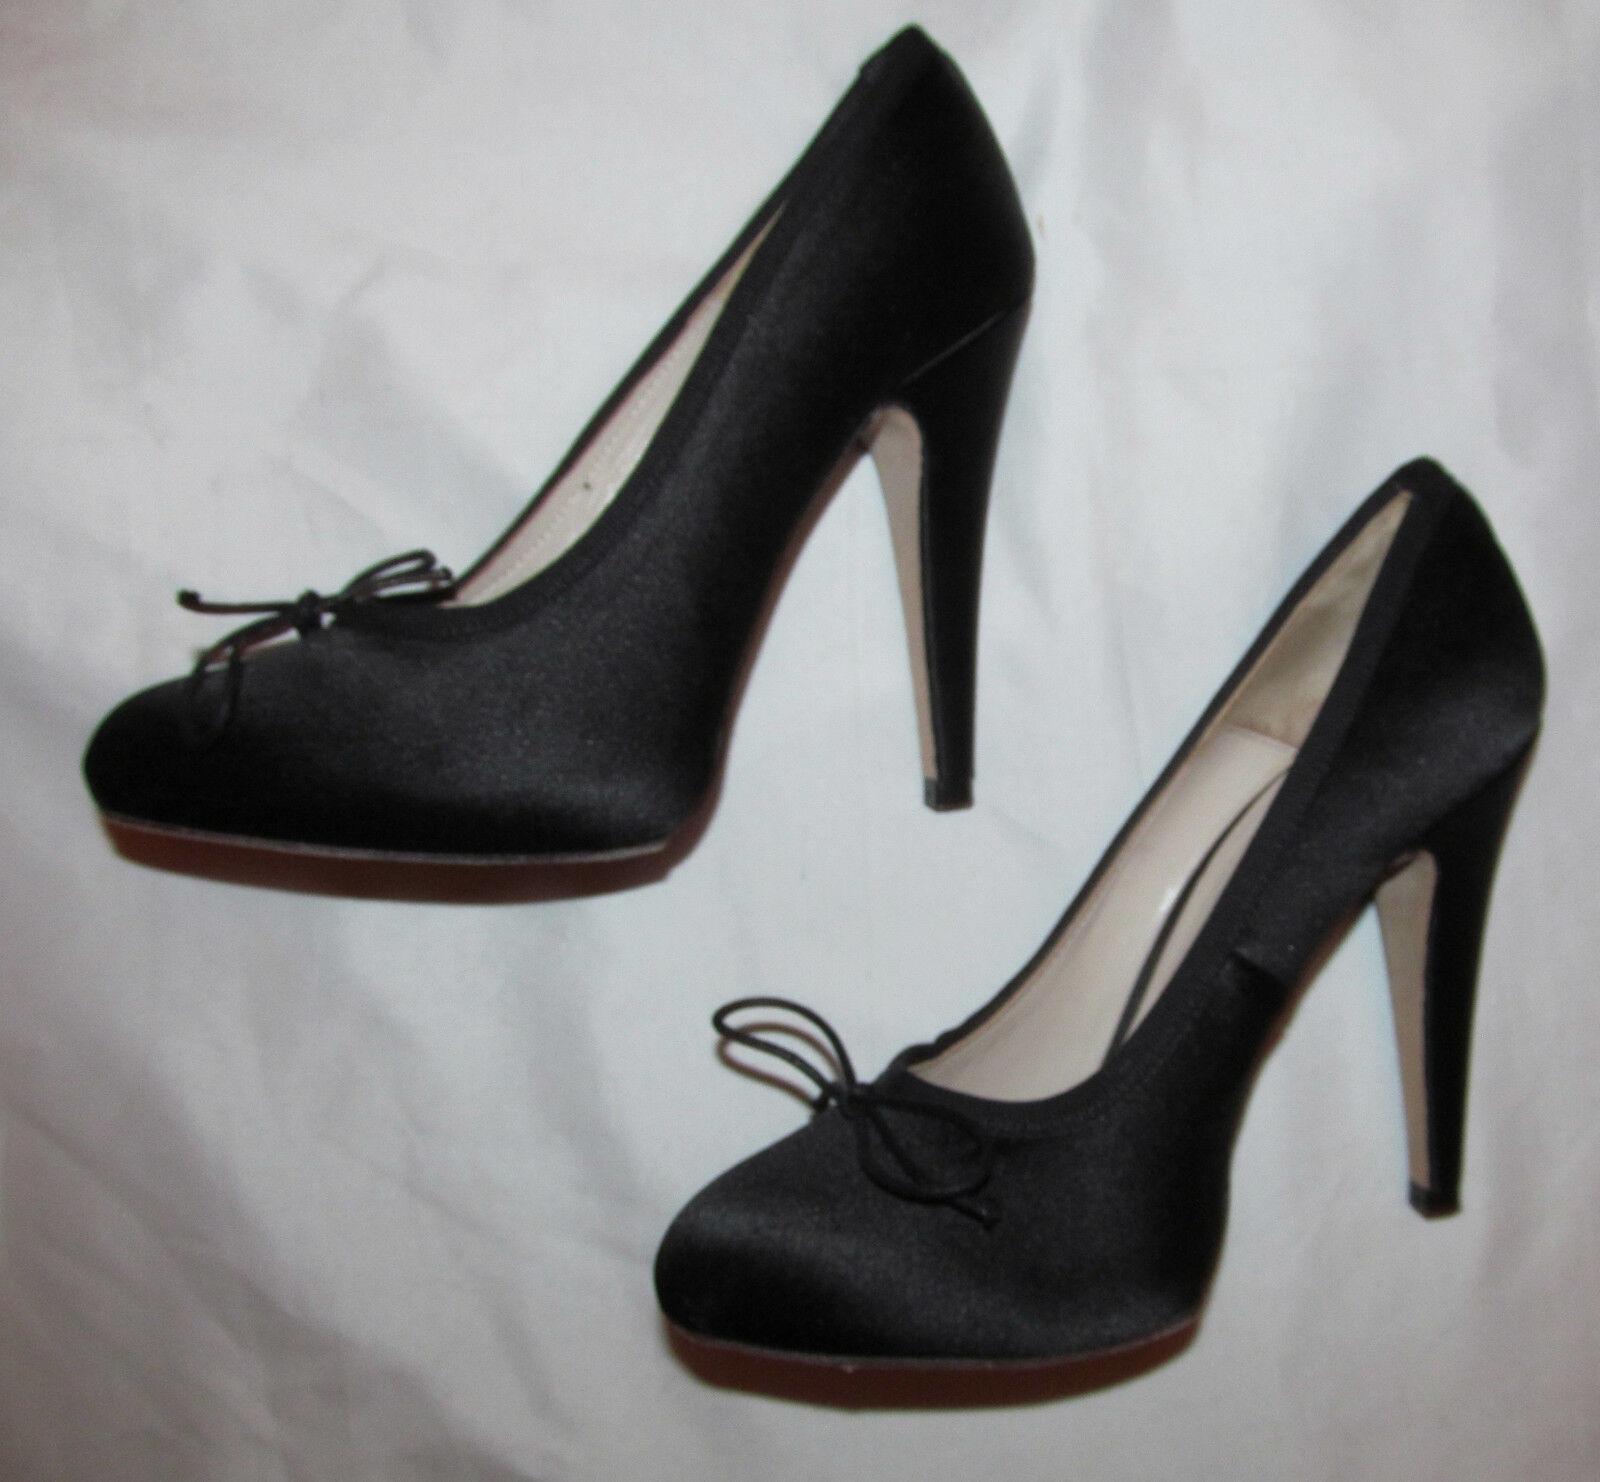 wholesape economico HOSS INTROPIA satin hidden platform bow sexy sexy sexy pumps scarpe 38 8 M worn once  fino al 42% di sconto